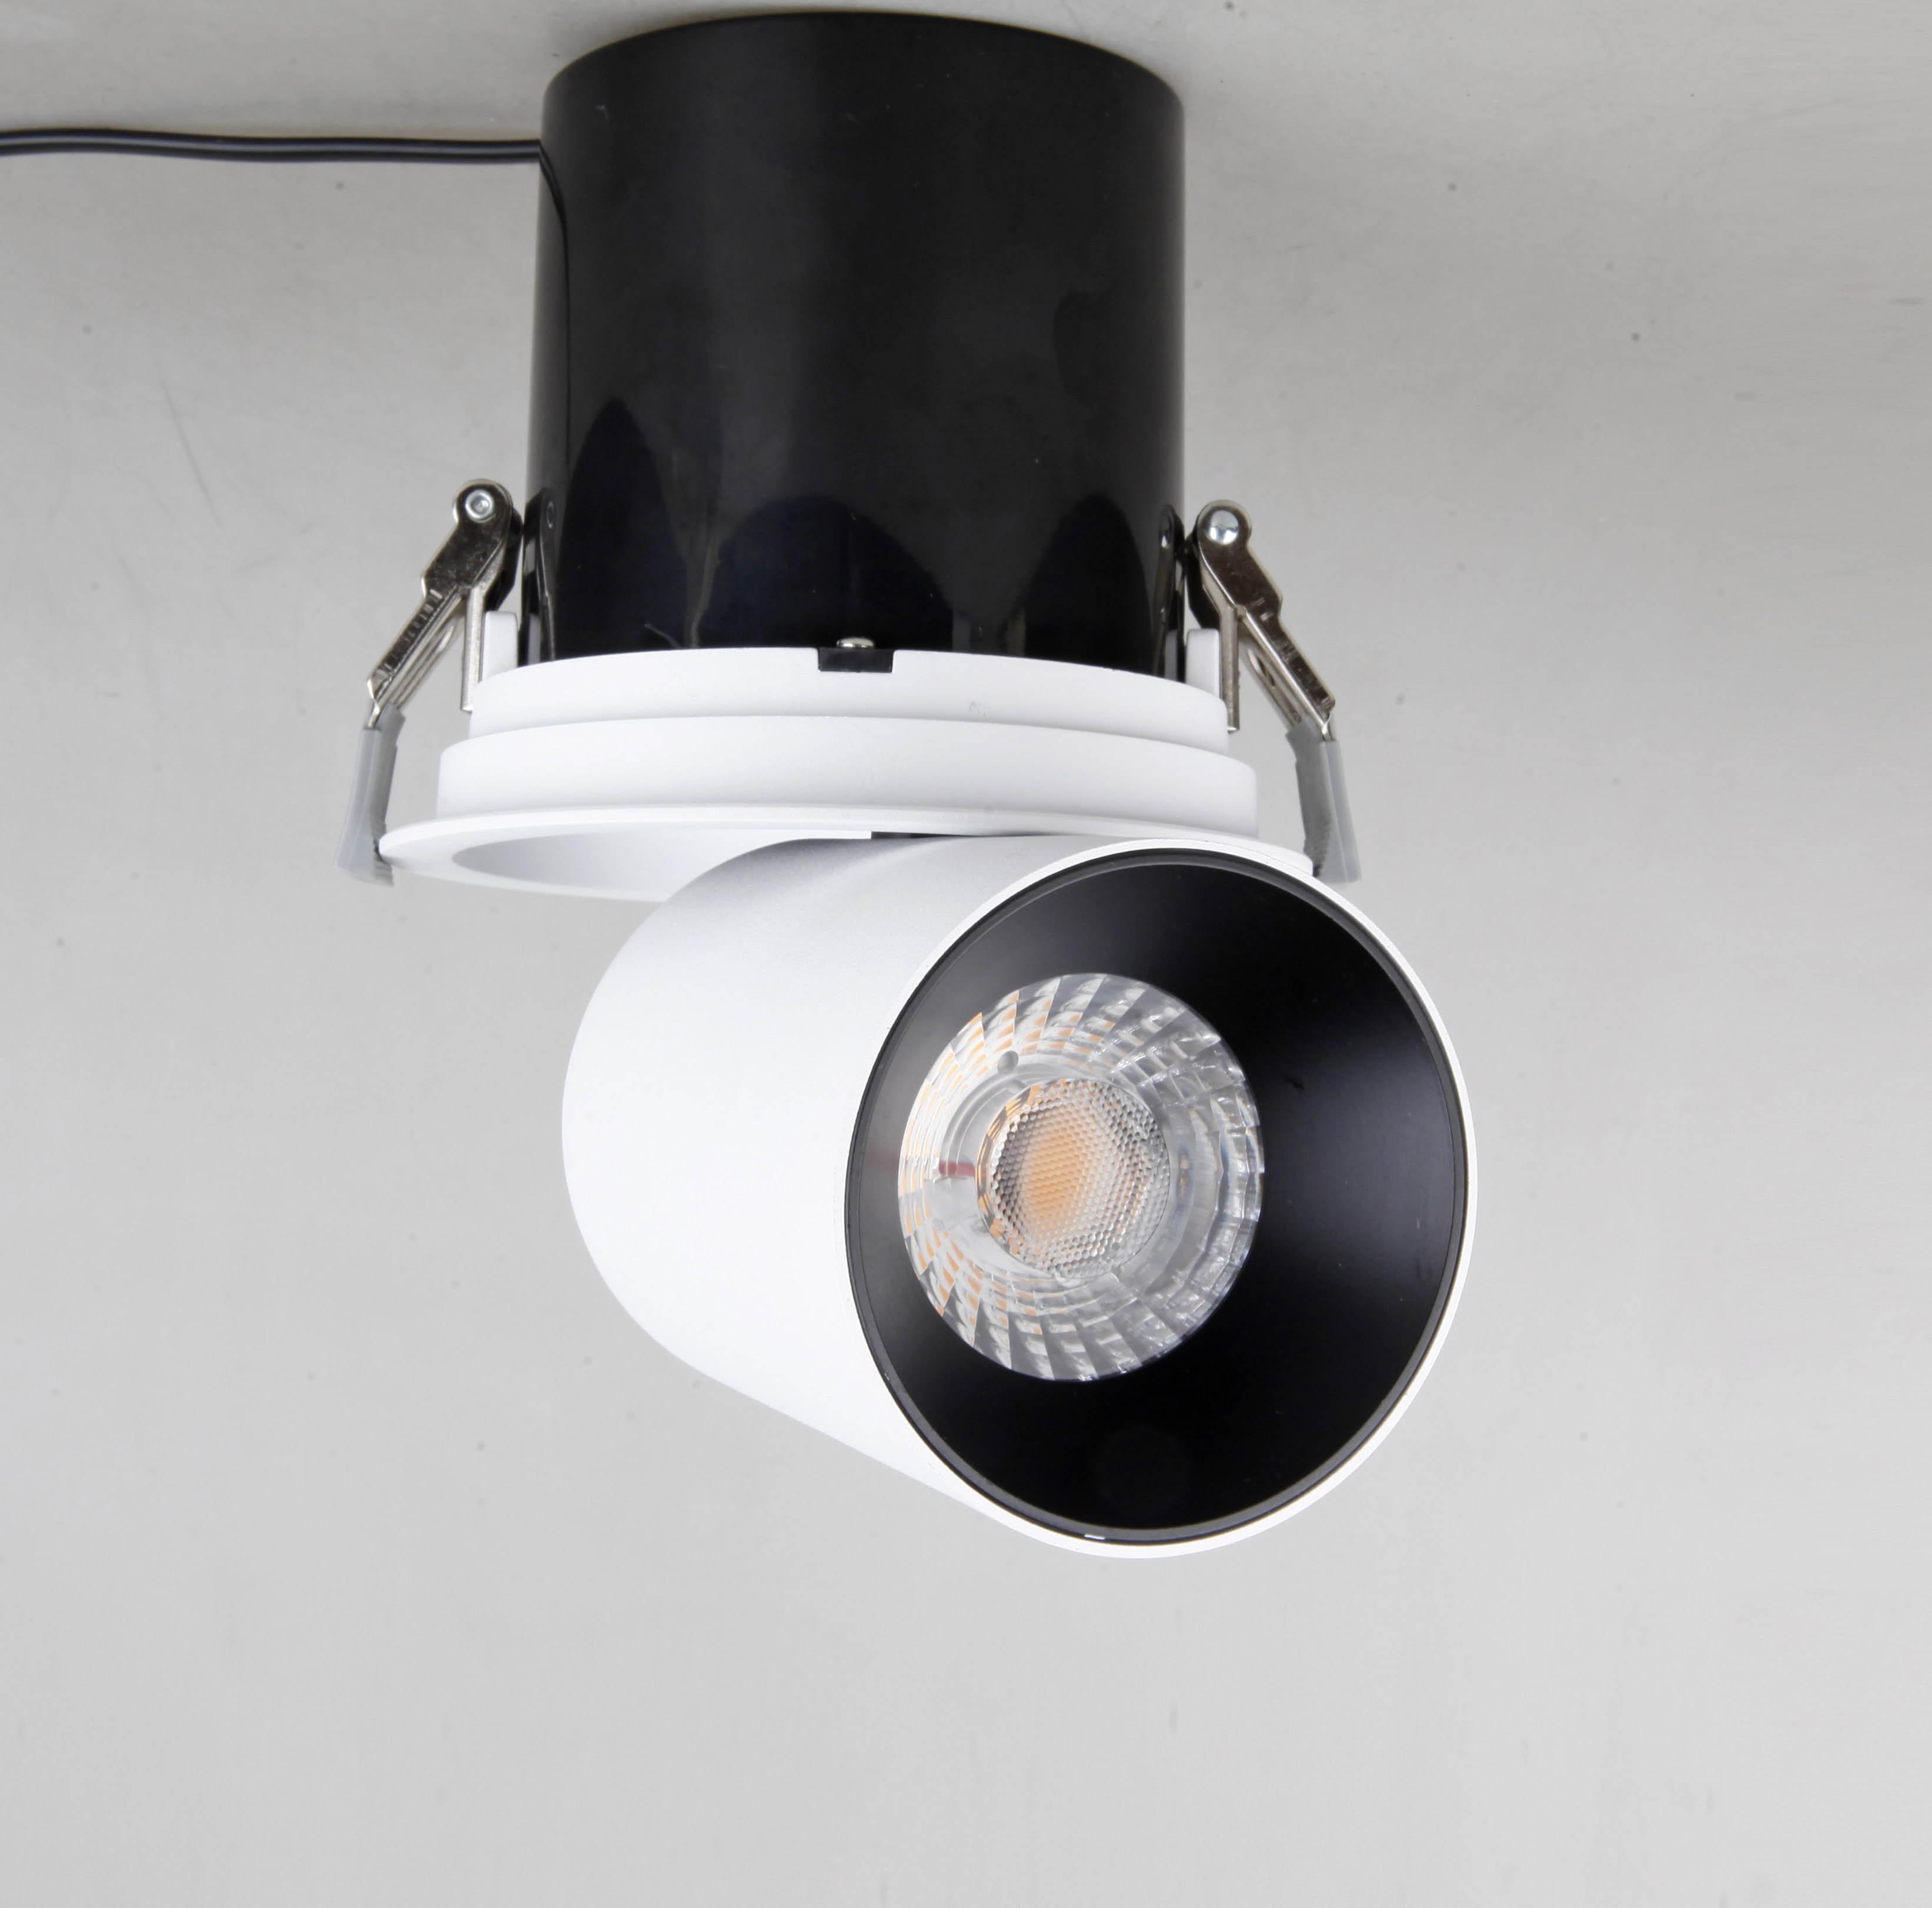 DGT Lighting dim indoor led spotlight factory for club-1